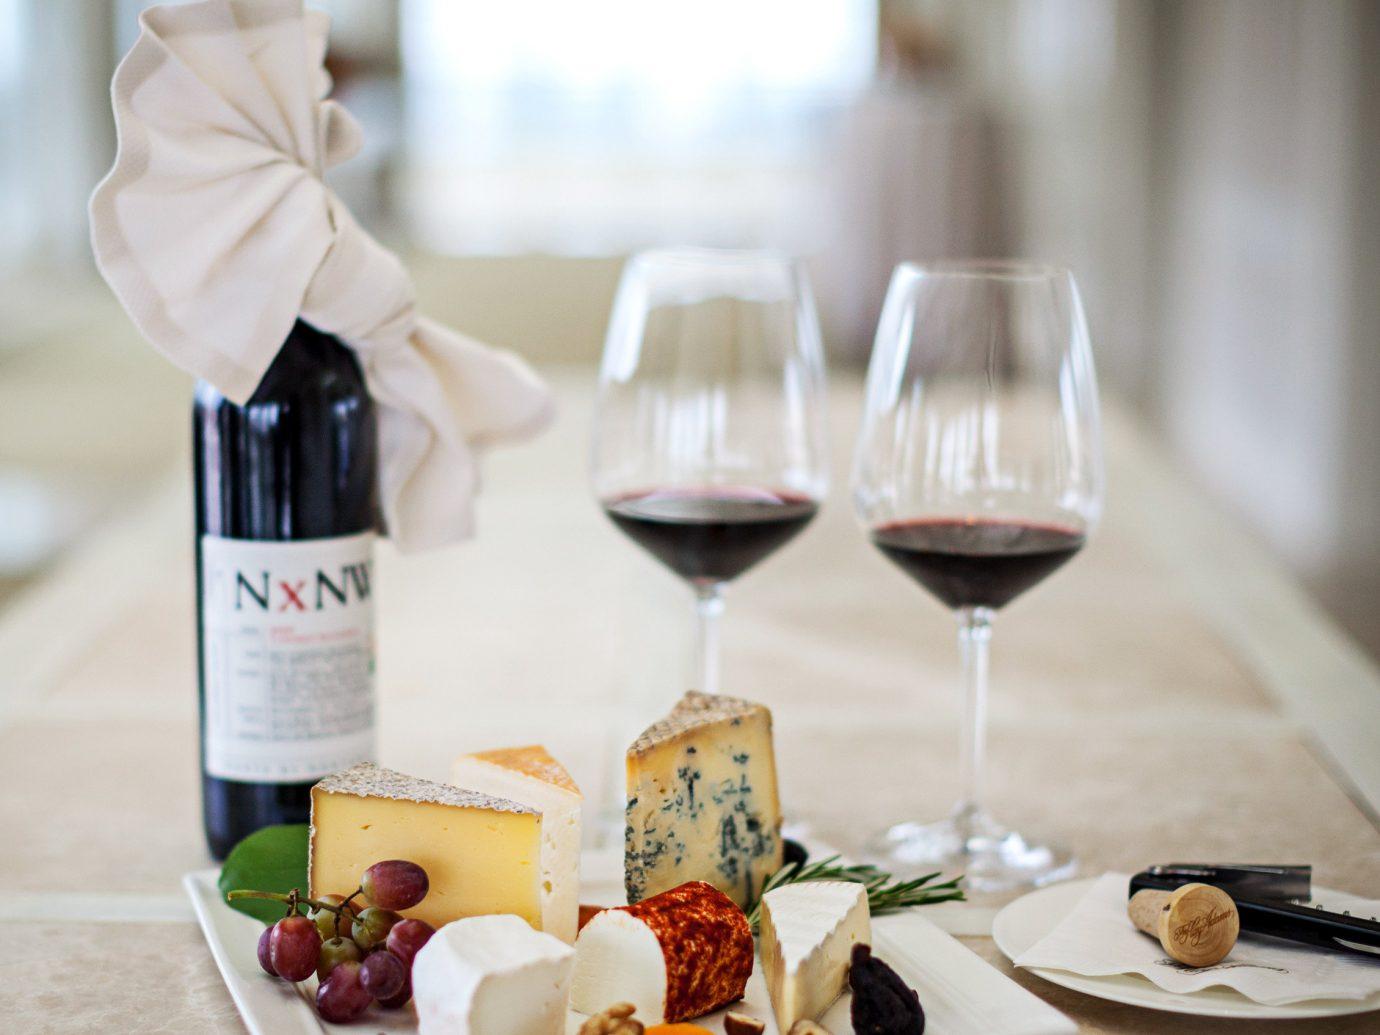 Bar Dining Drink Eat Elegant Hotels Luxury wine table indoor meal brunch lunch sense restaurant food dining table